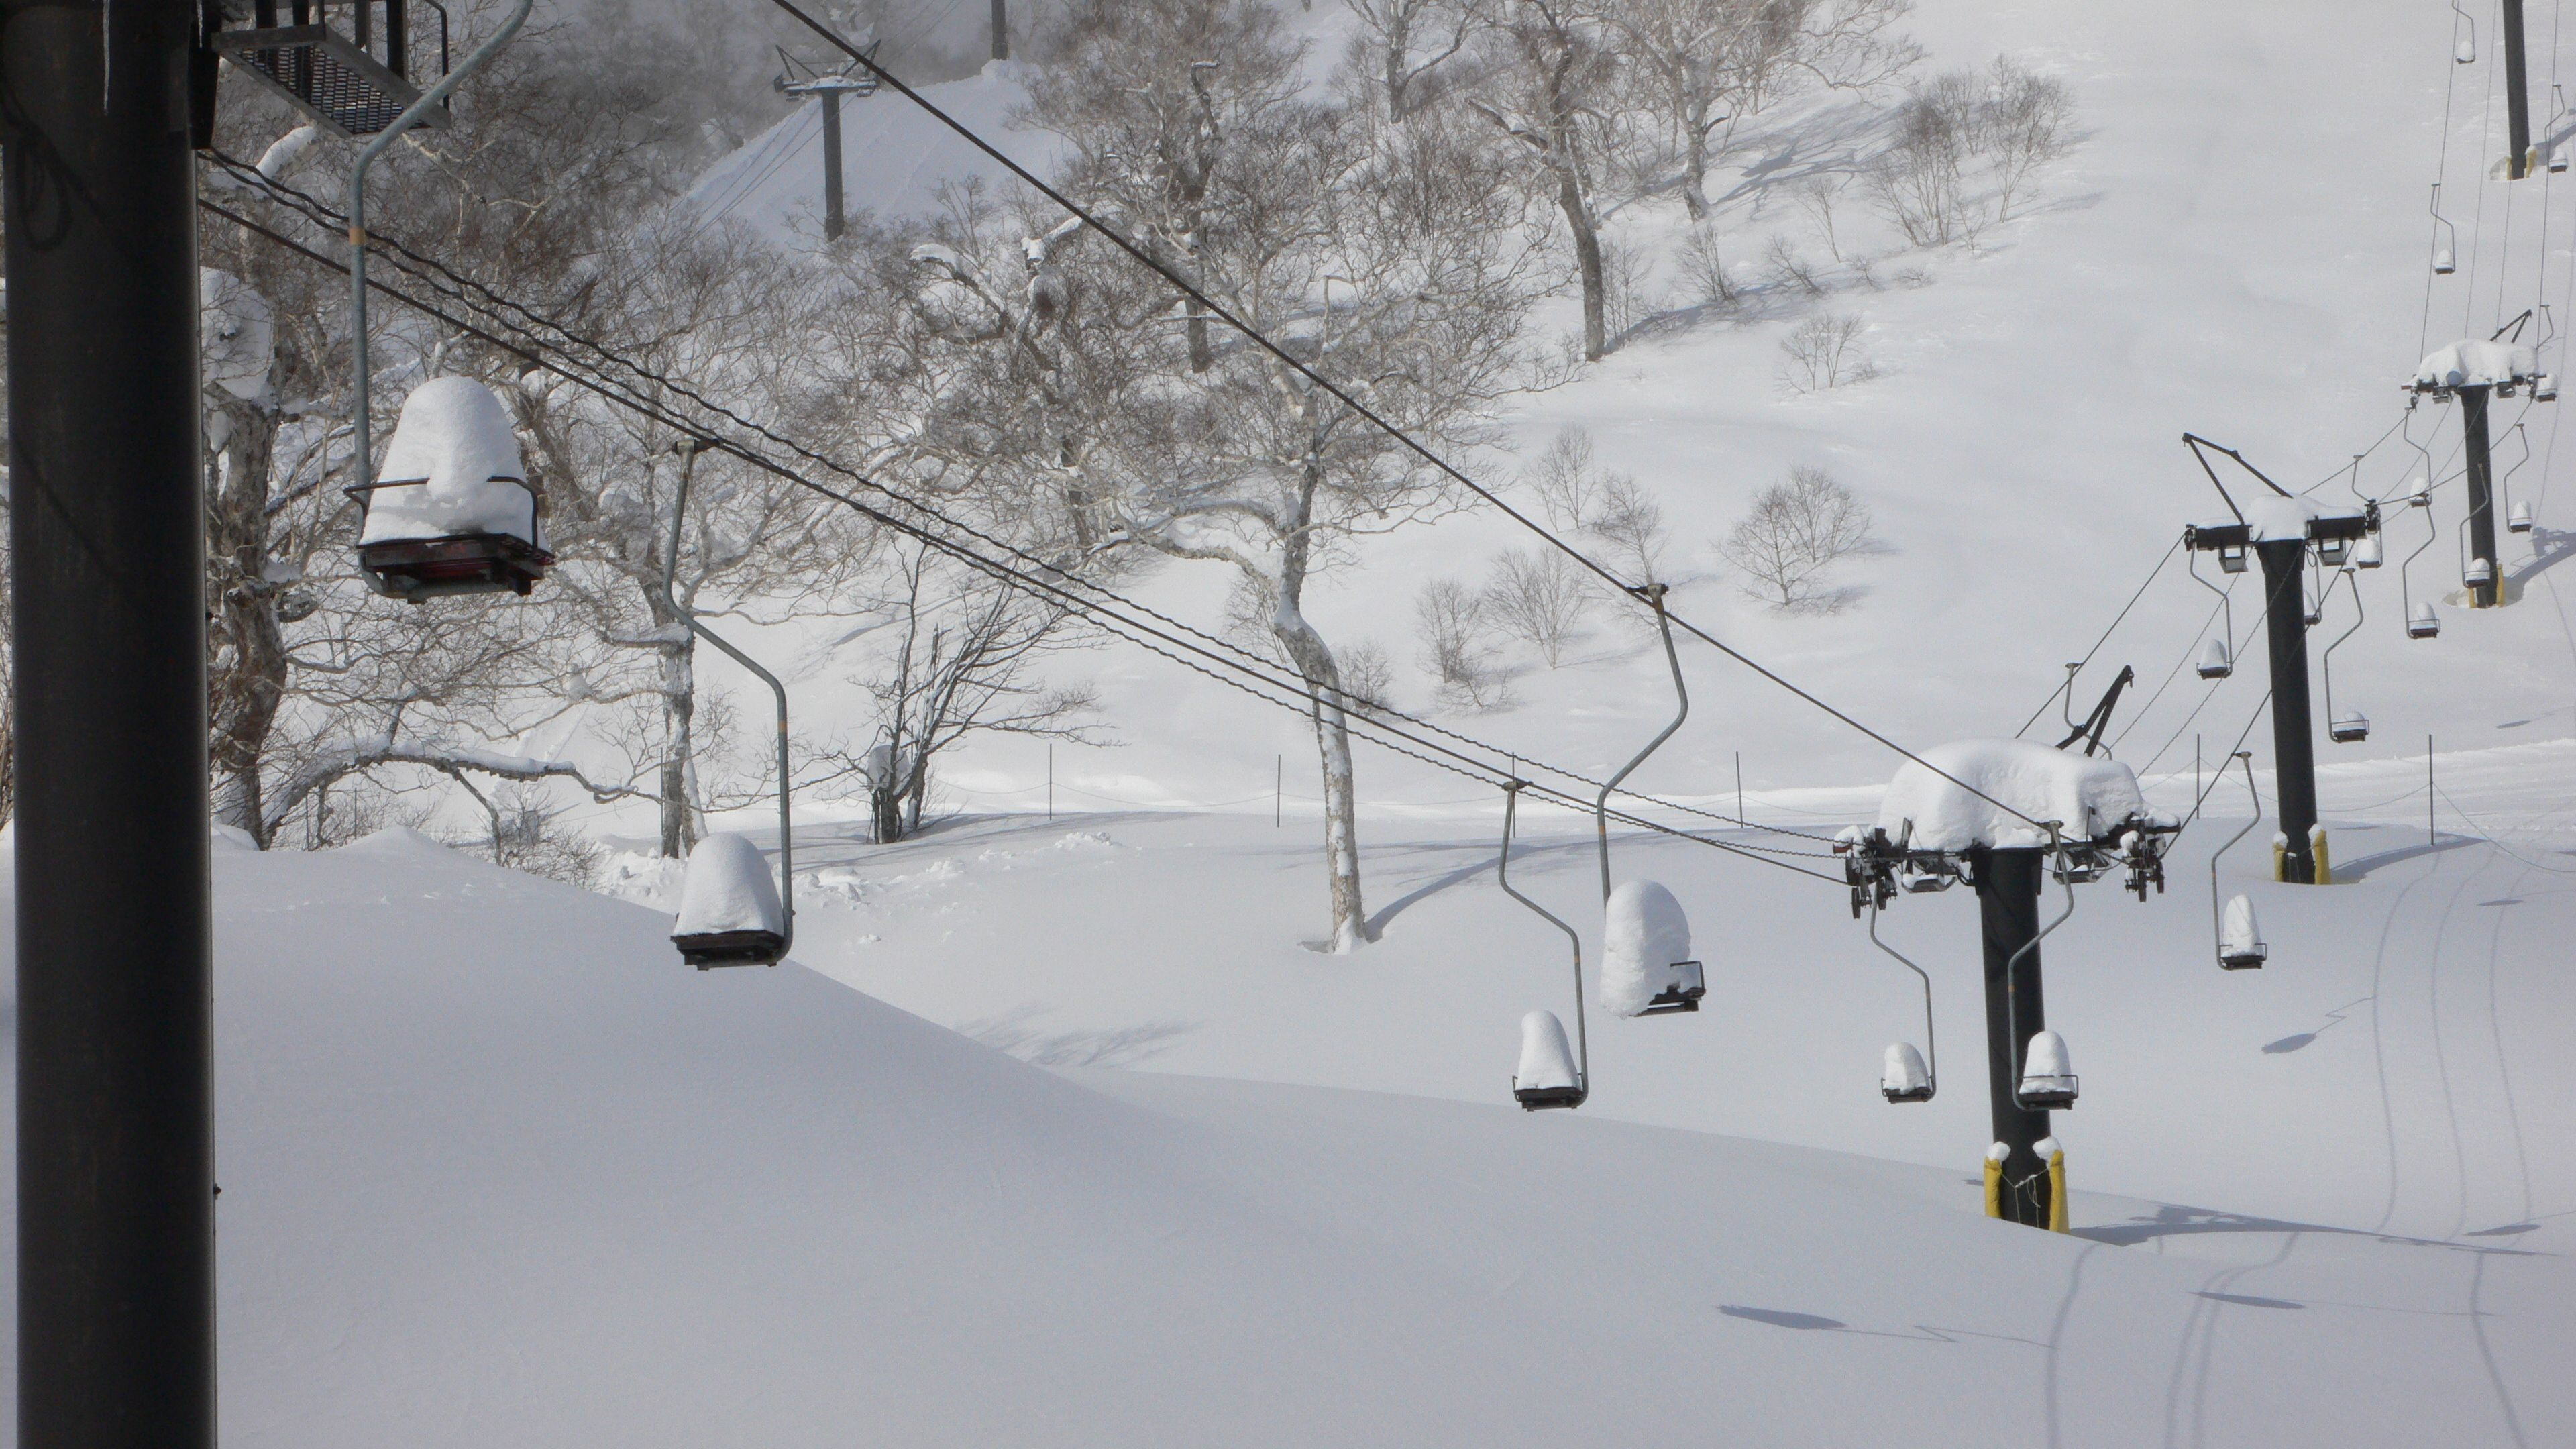 Snowy Ski Lifts Niseko Japan Japan Travel Japan Trip